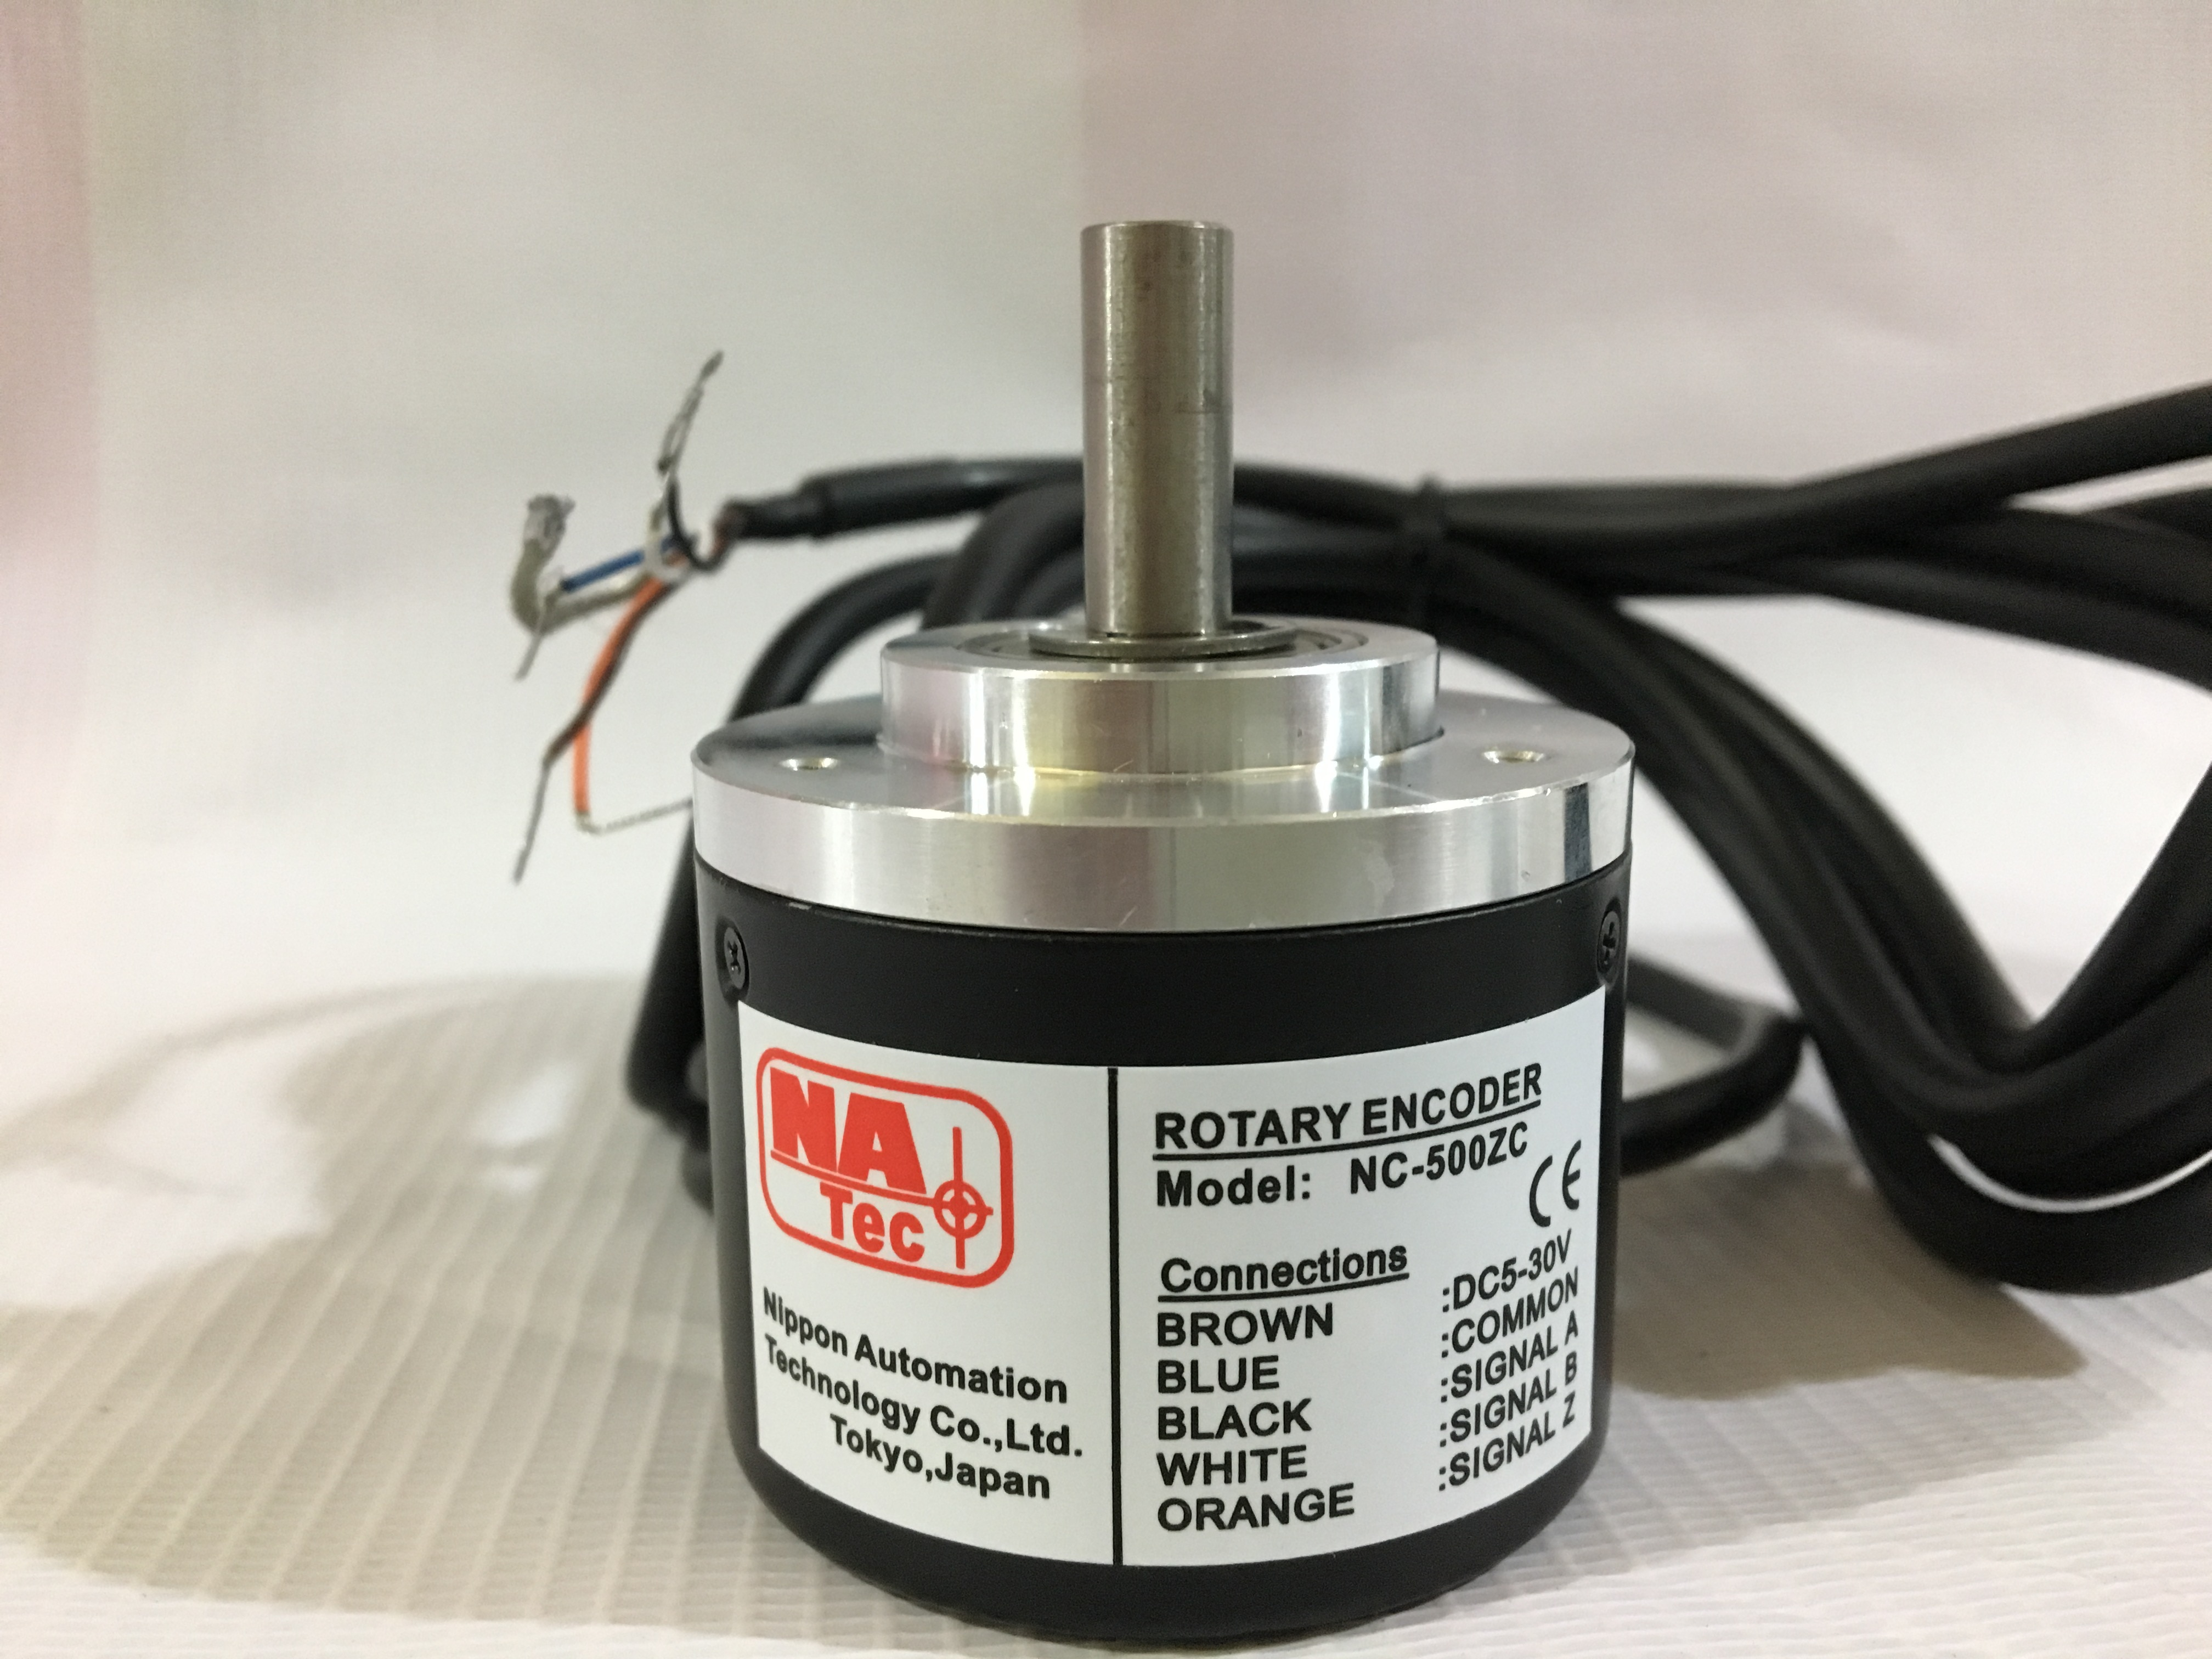 NB-360ZC энкодер NC-1000ZV NE-200ZT 100 1024